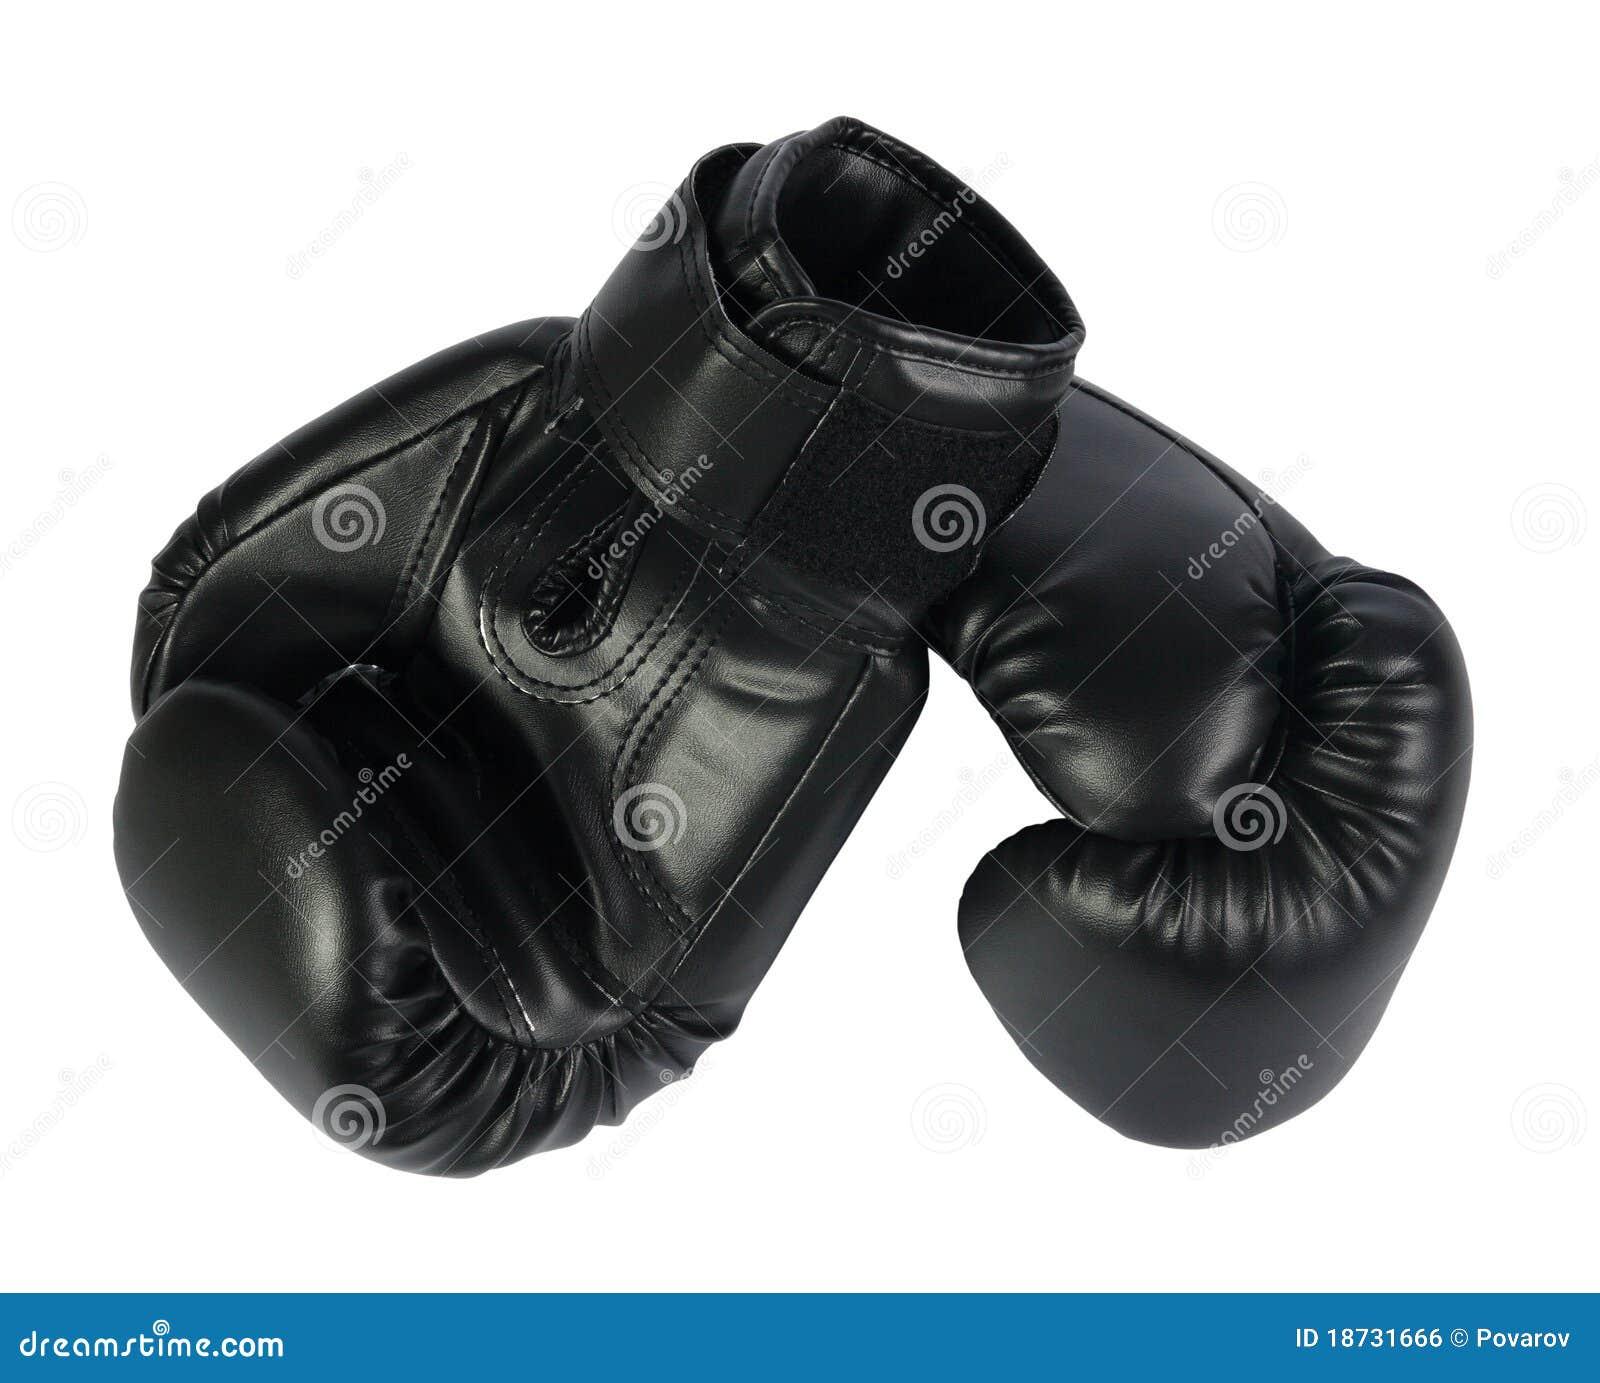 Black Boxing-gloves Stock Photo. Image Of Glove, Round